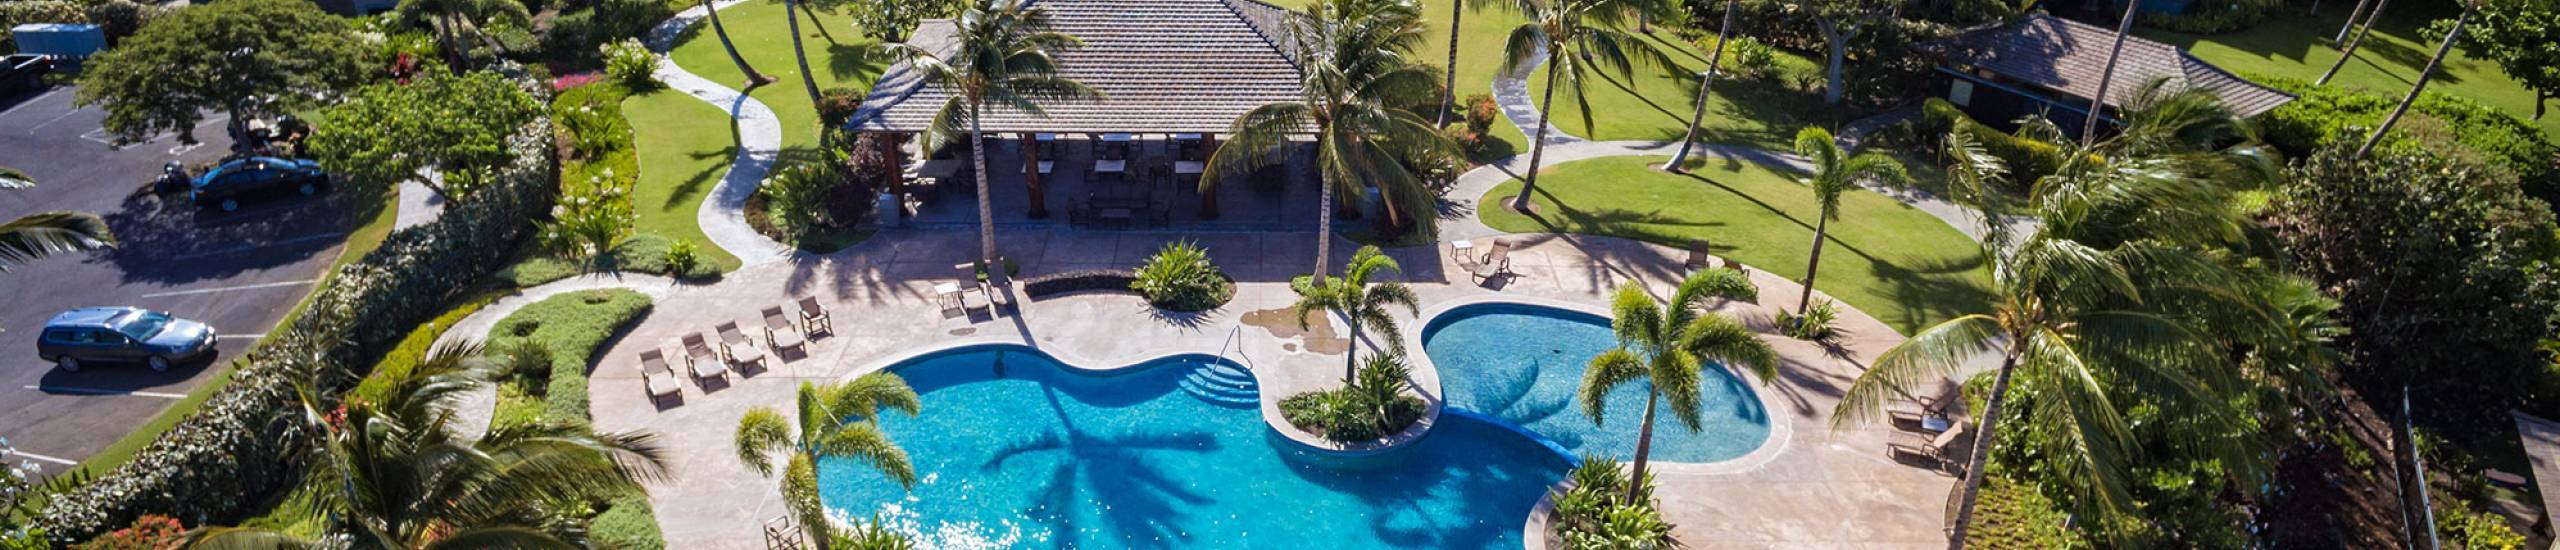 Private pool at KaMilo at Mauna Lani Resort